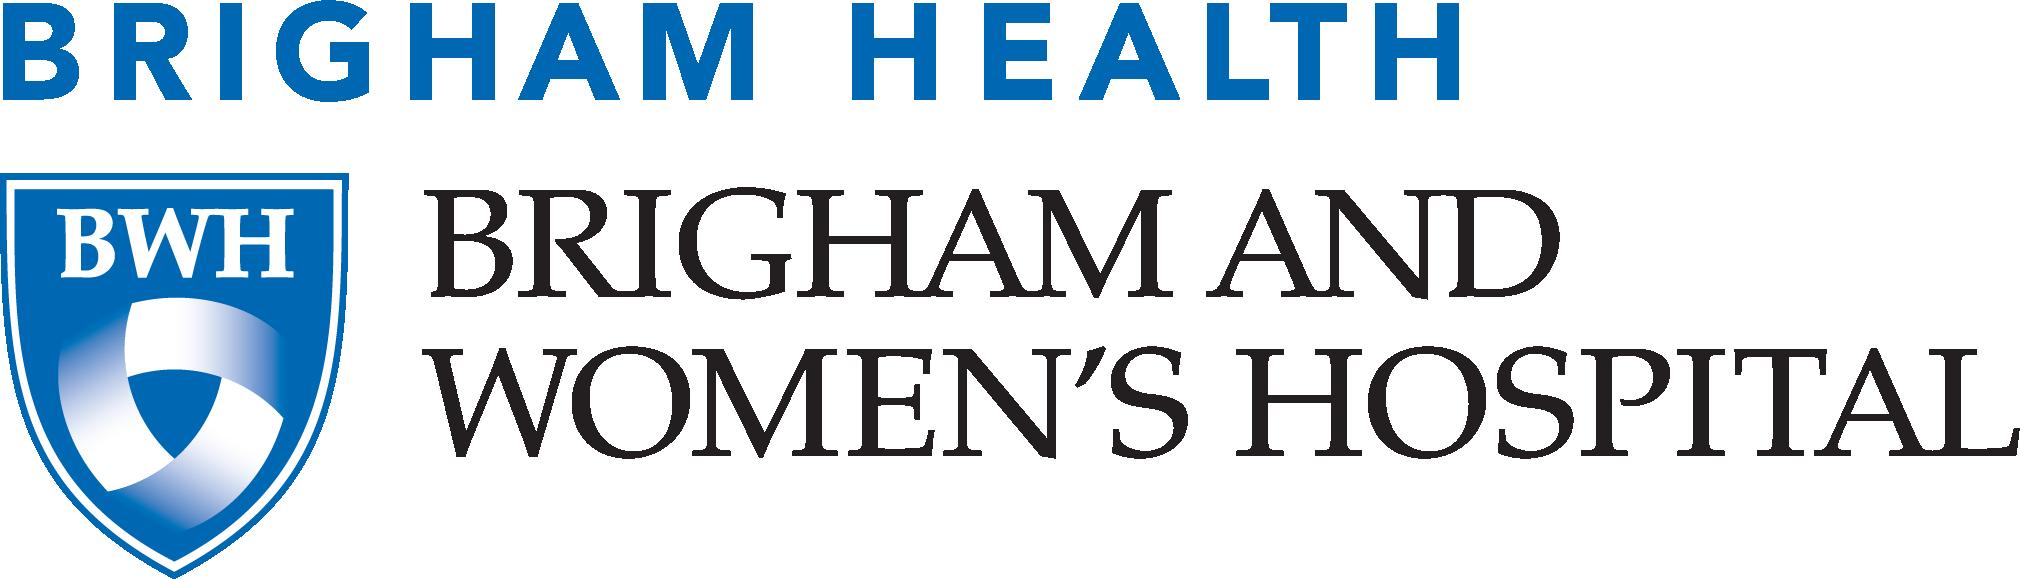 BrighamHealth_logo transparent